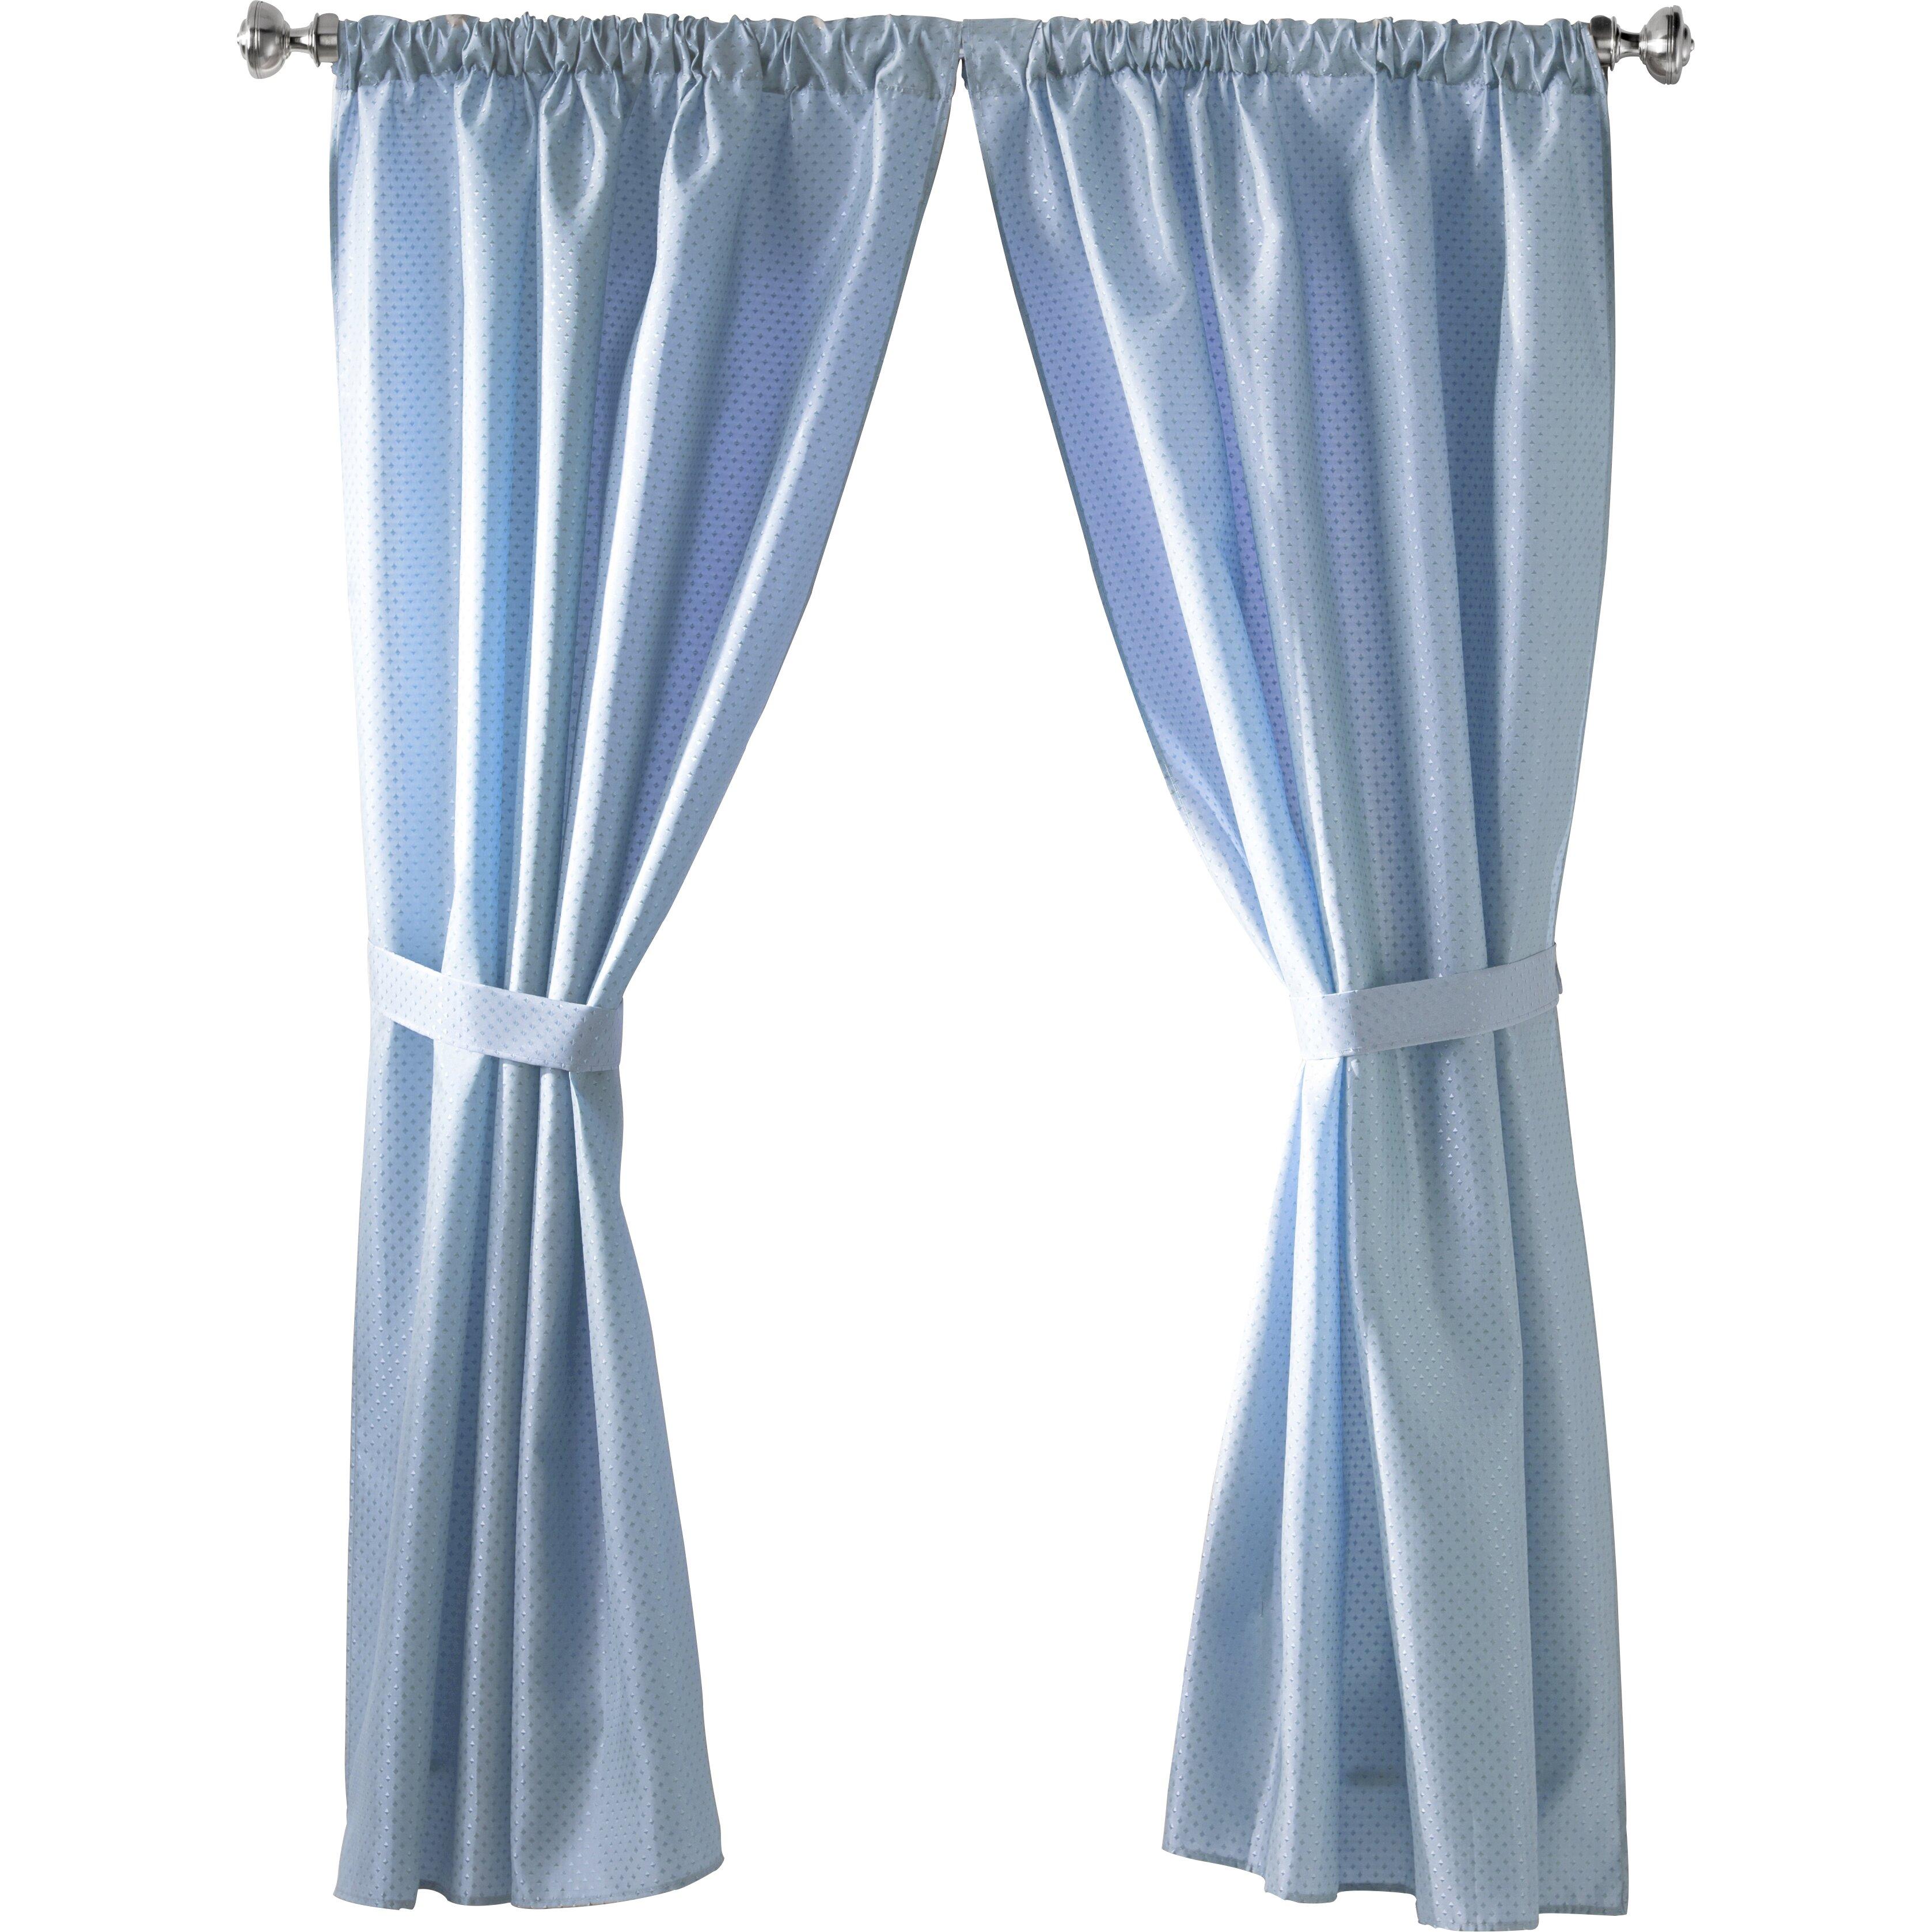 wayfair basics wayfair basics rod pocket curtain panels